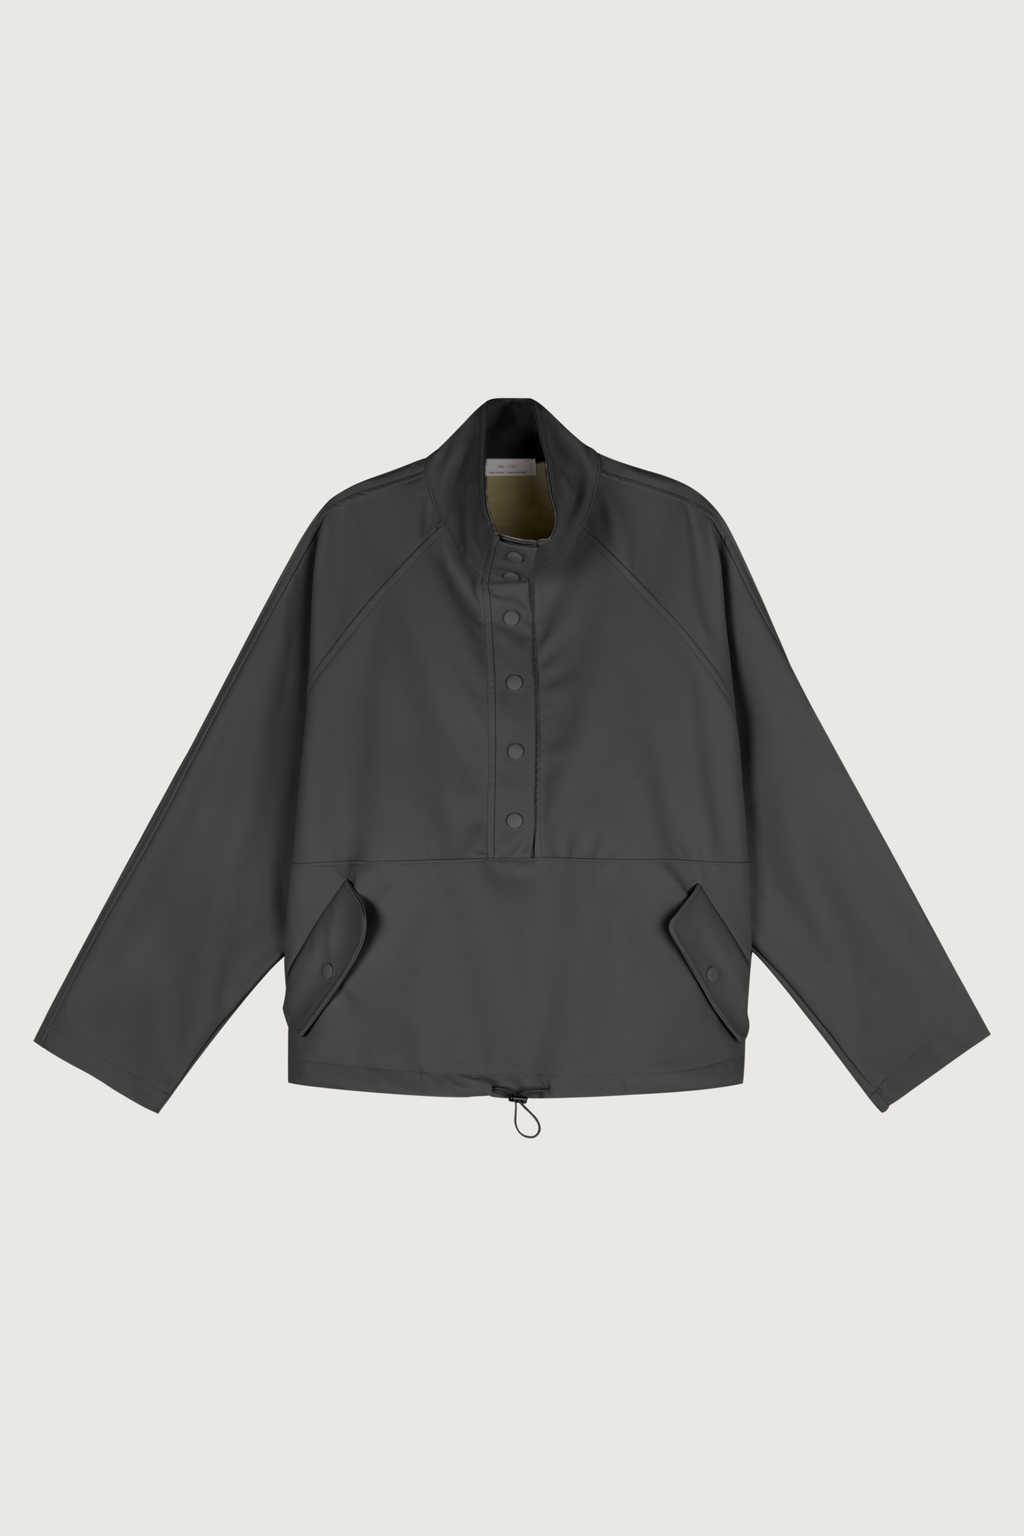 Jacket J001 Black 7